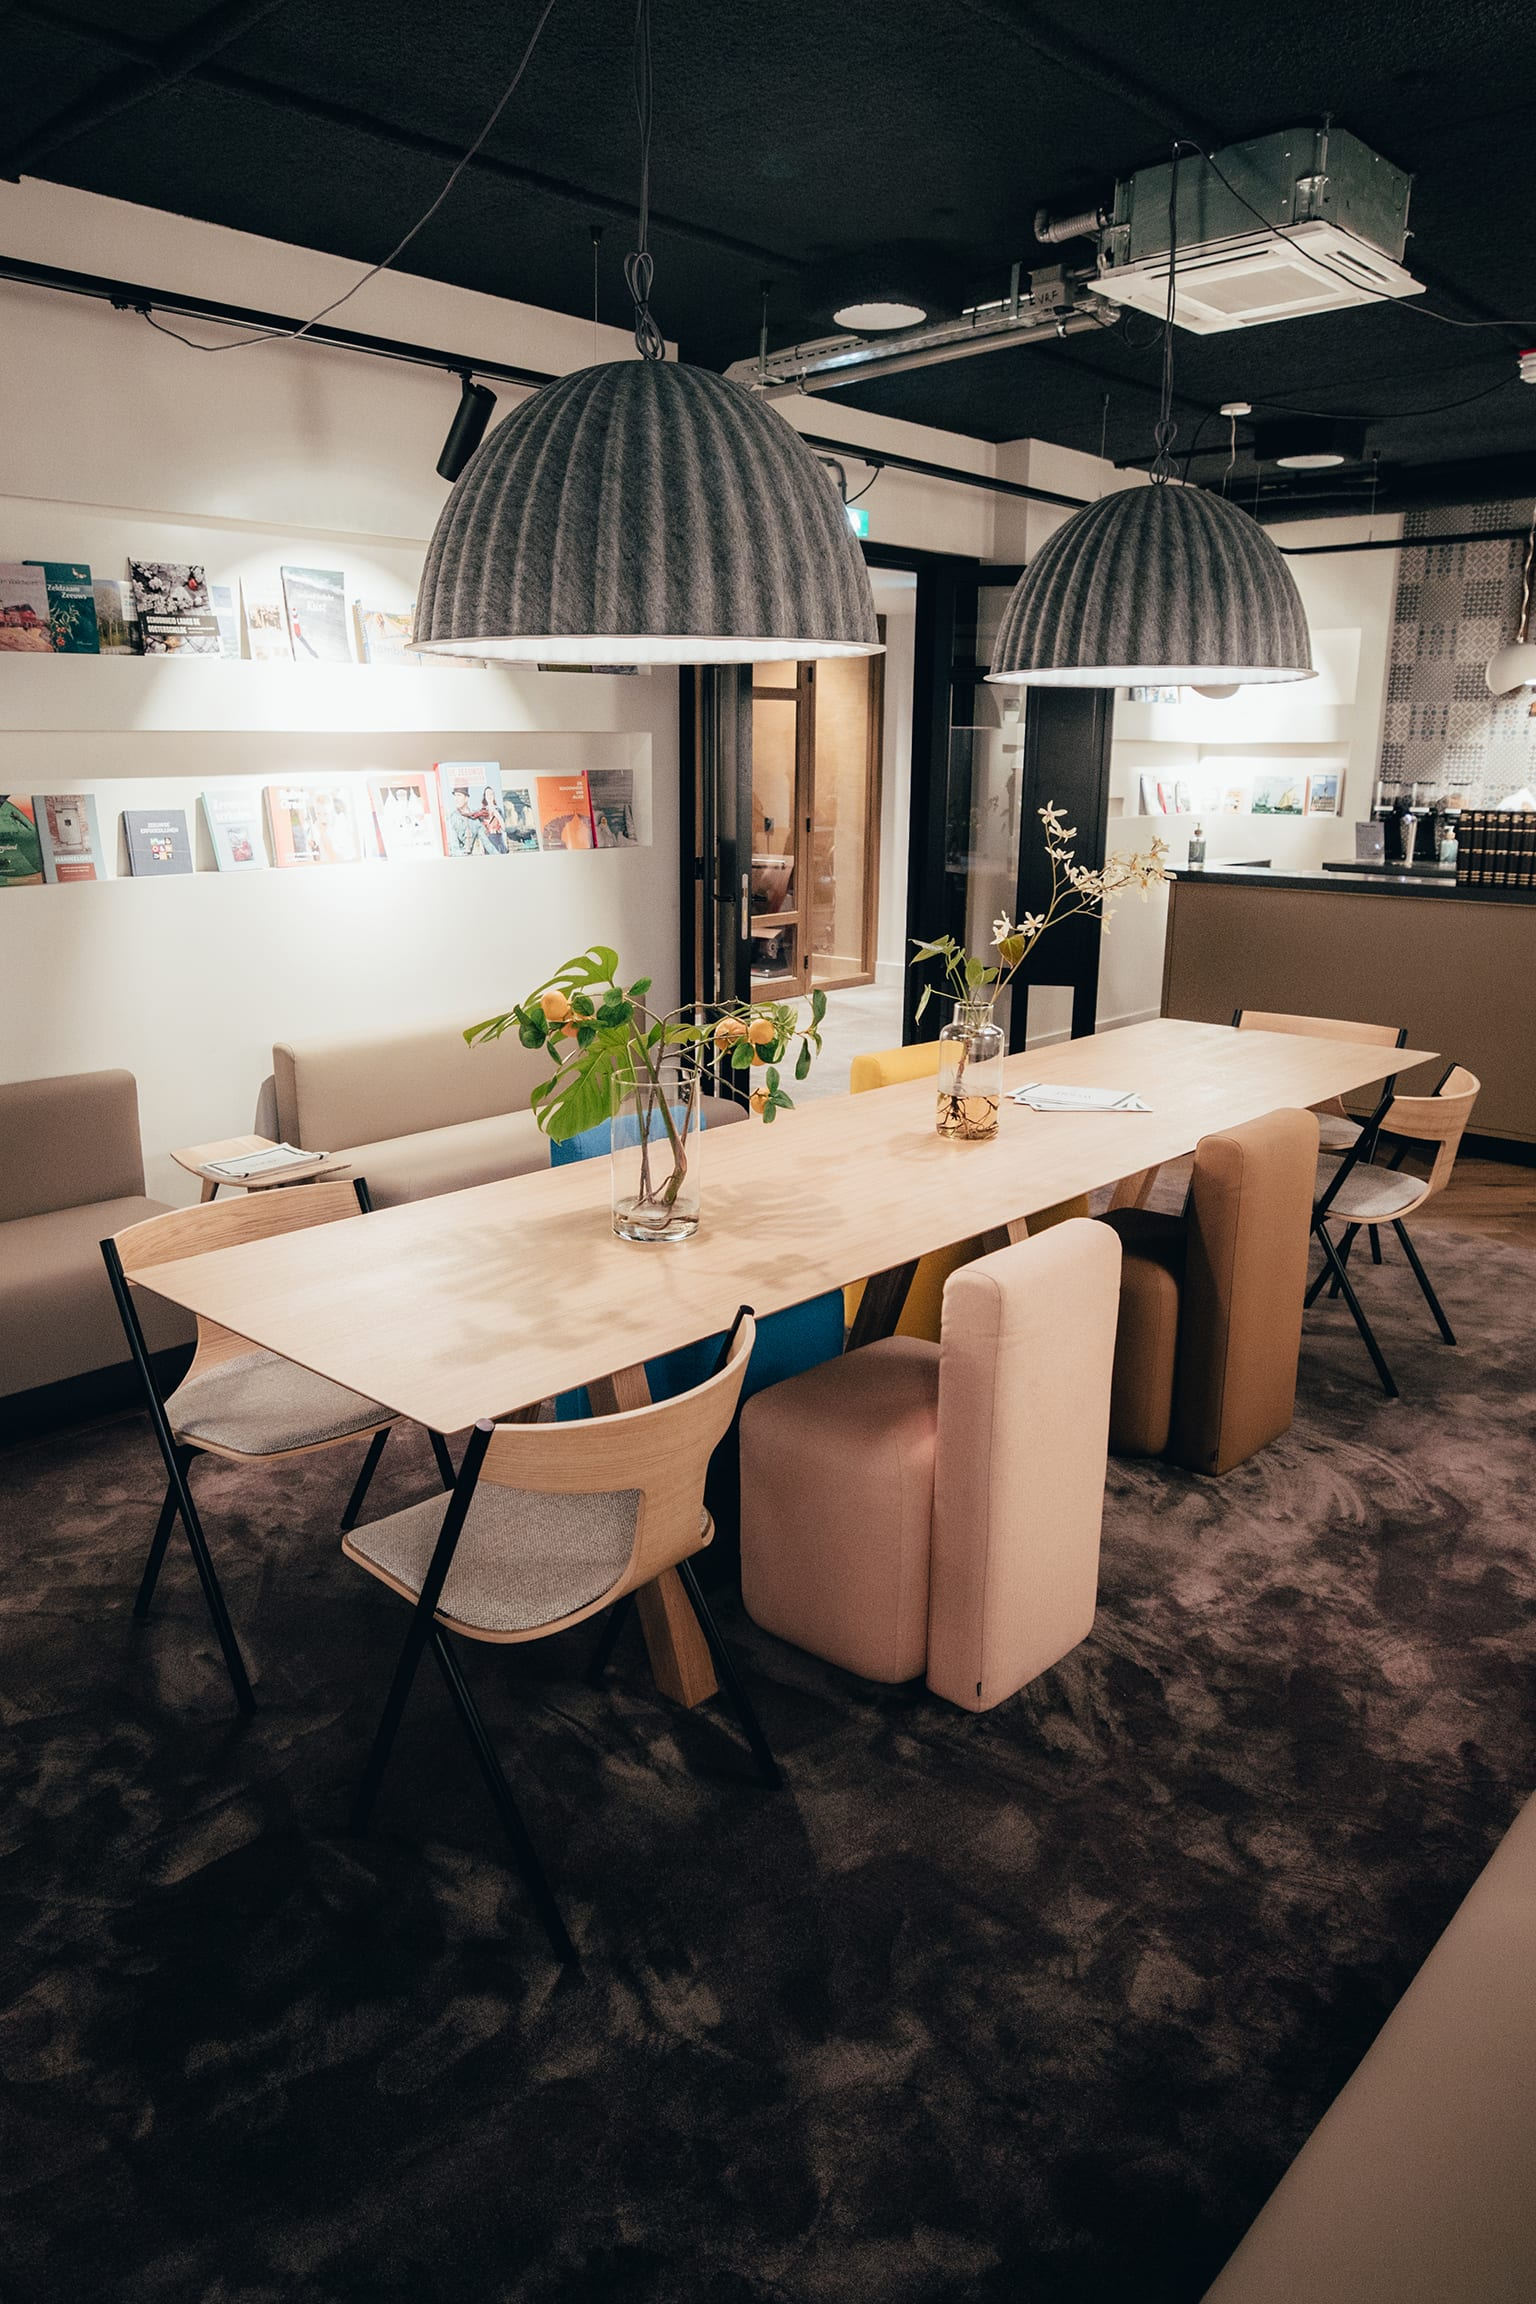 Hotel Citywood – Middelburg